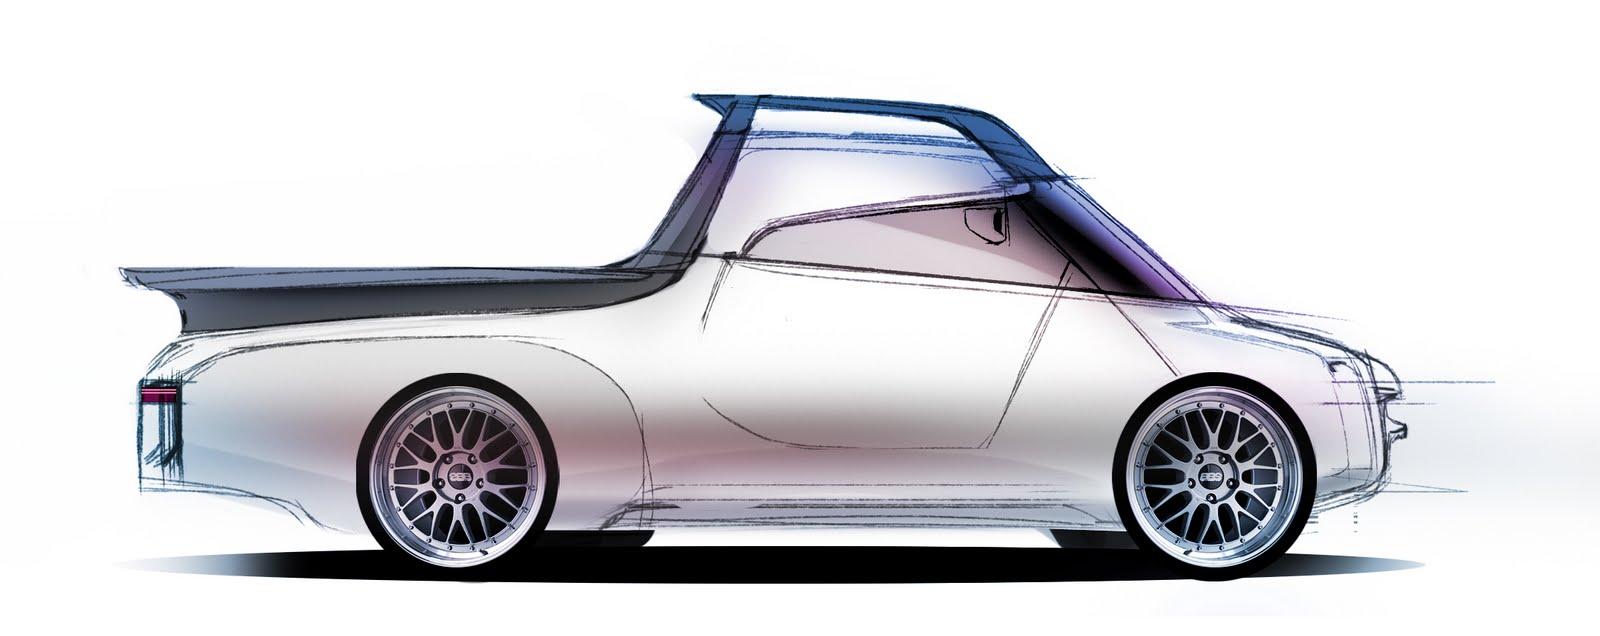 V Ling Honda